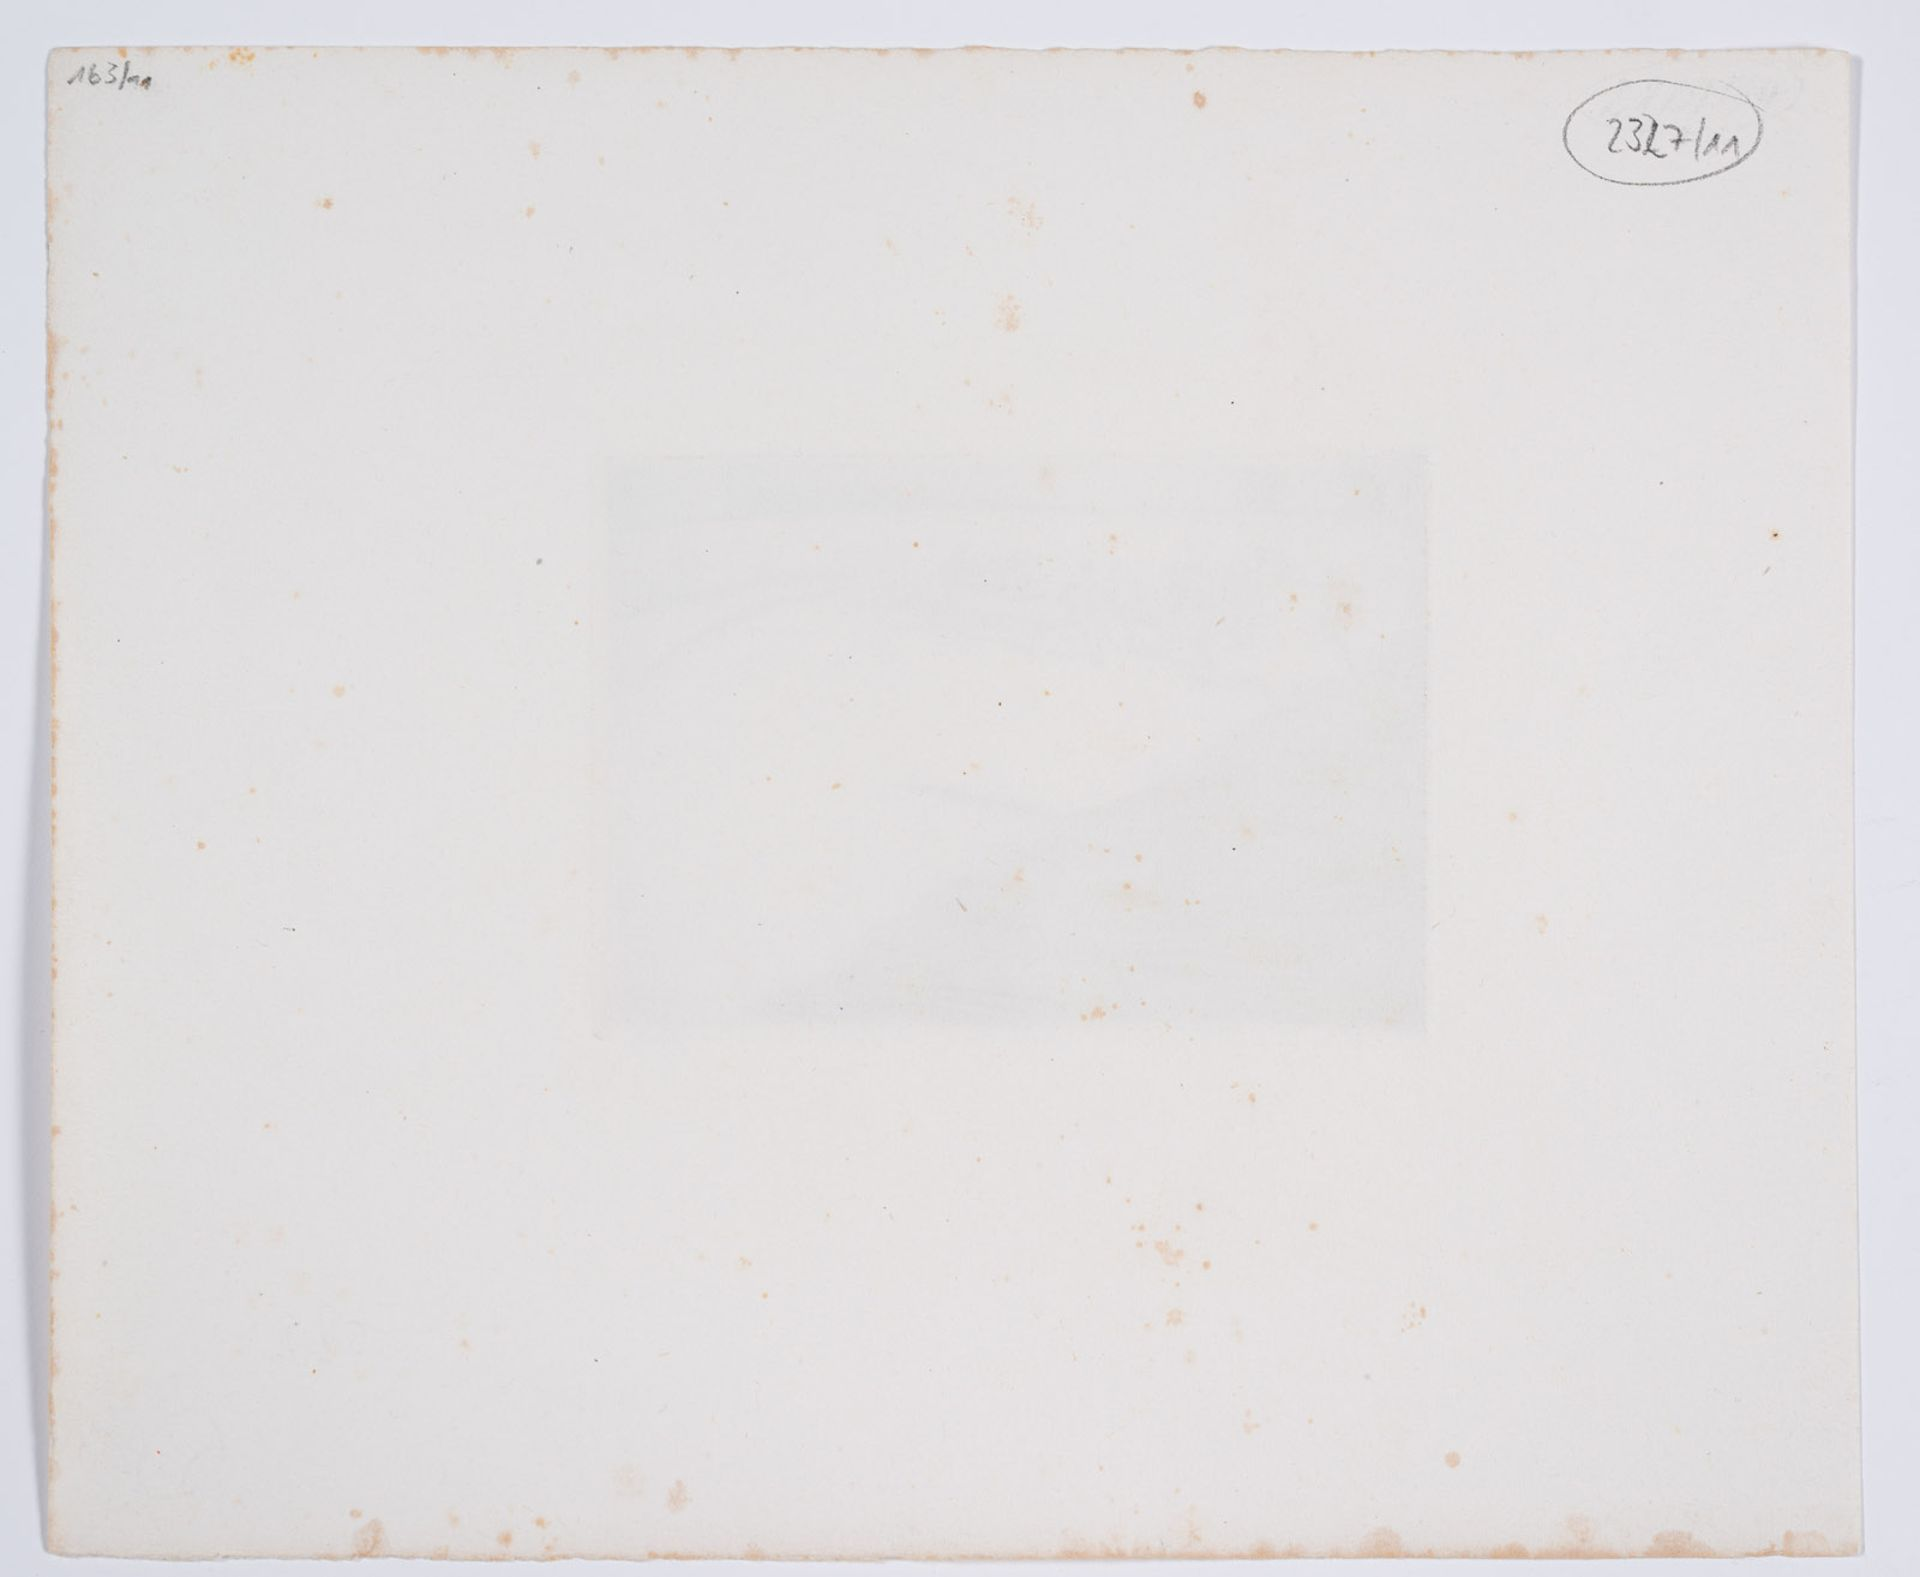 Geiger, Willi - Image 6 of 22